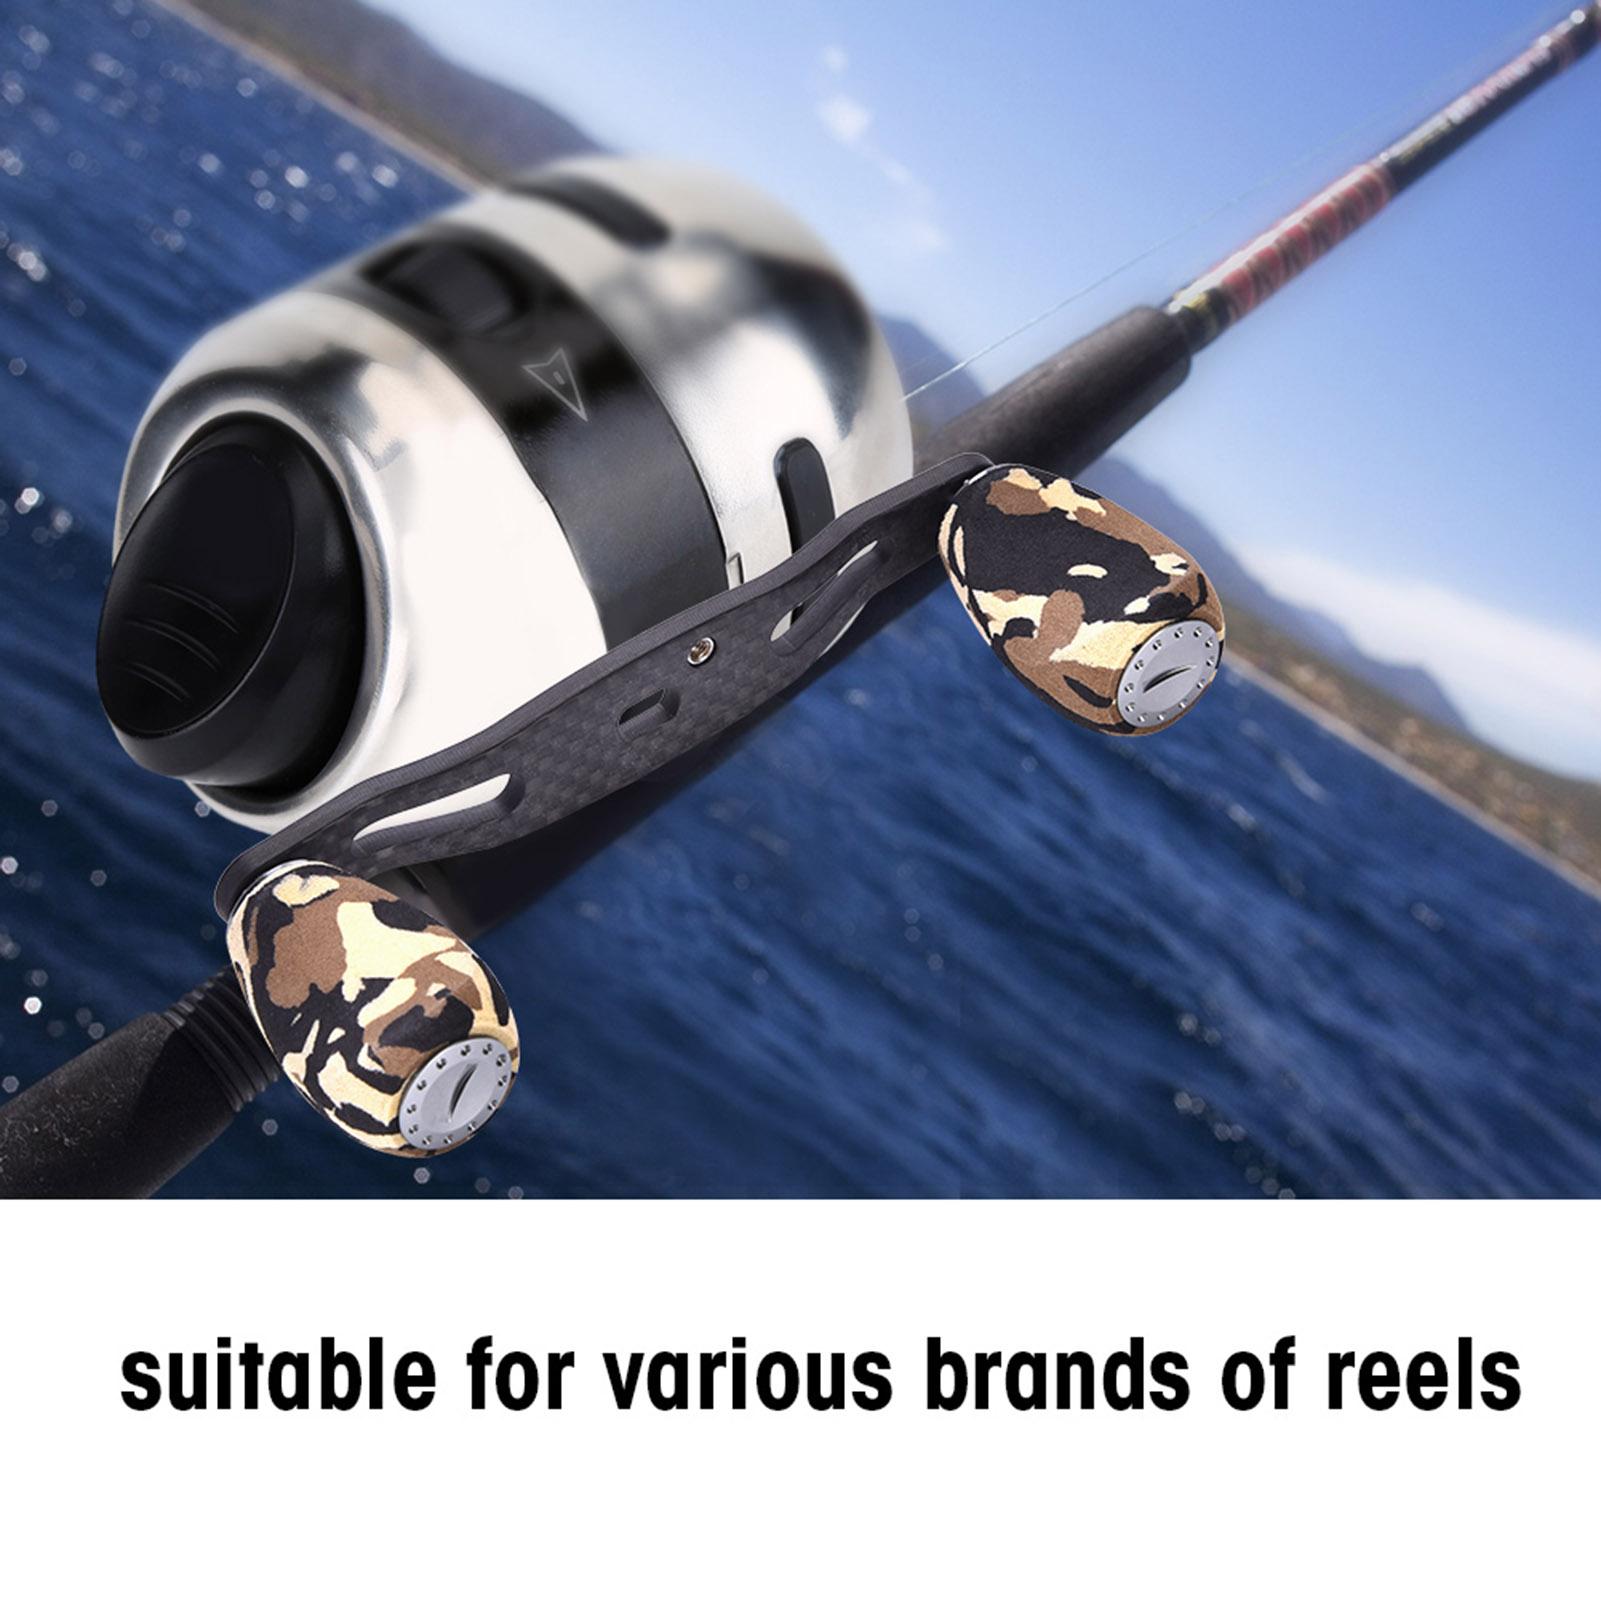 Portable-Carbon-Fiber-Fishing-Reel-Handle-Knob-For-Baitcasting-Fishing-Reel-LJ thumbnail 21